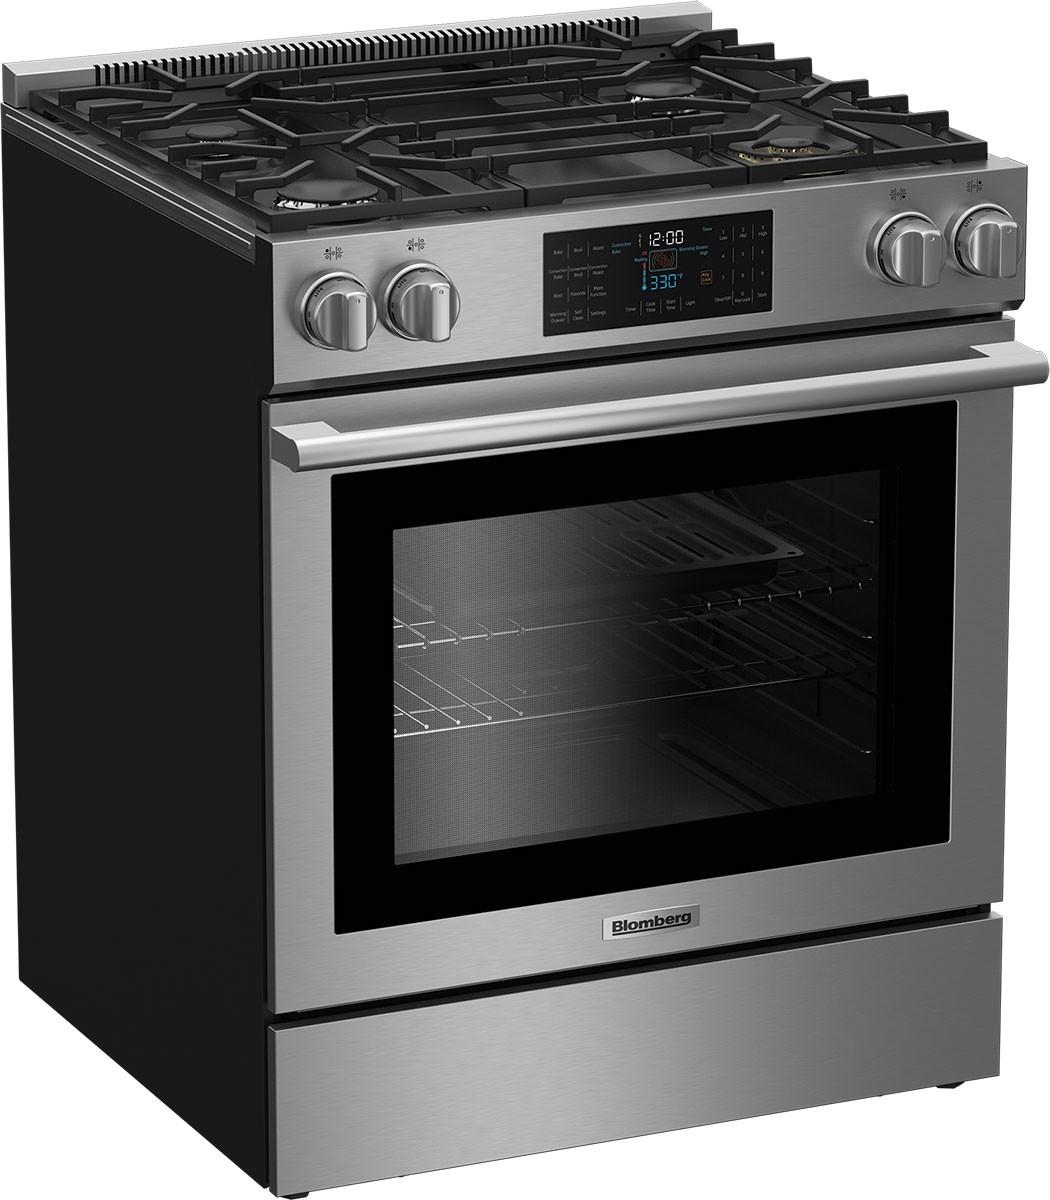 30 inch slide in gas range ranges cooking products. Black Bedroom Furniture Sets. Home Design Ideas